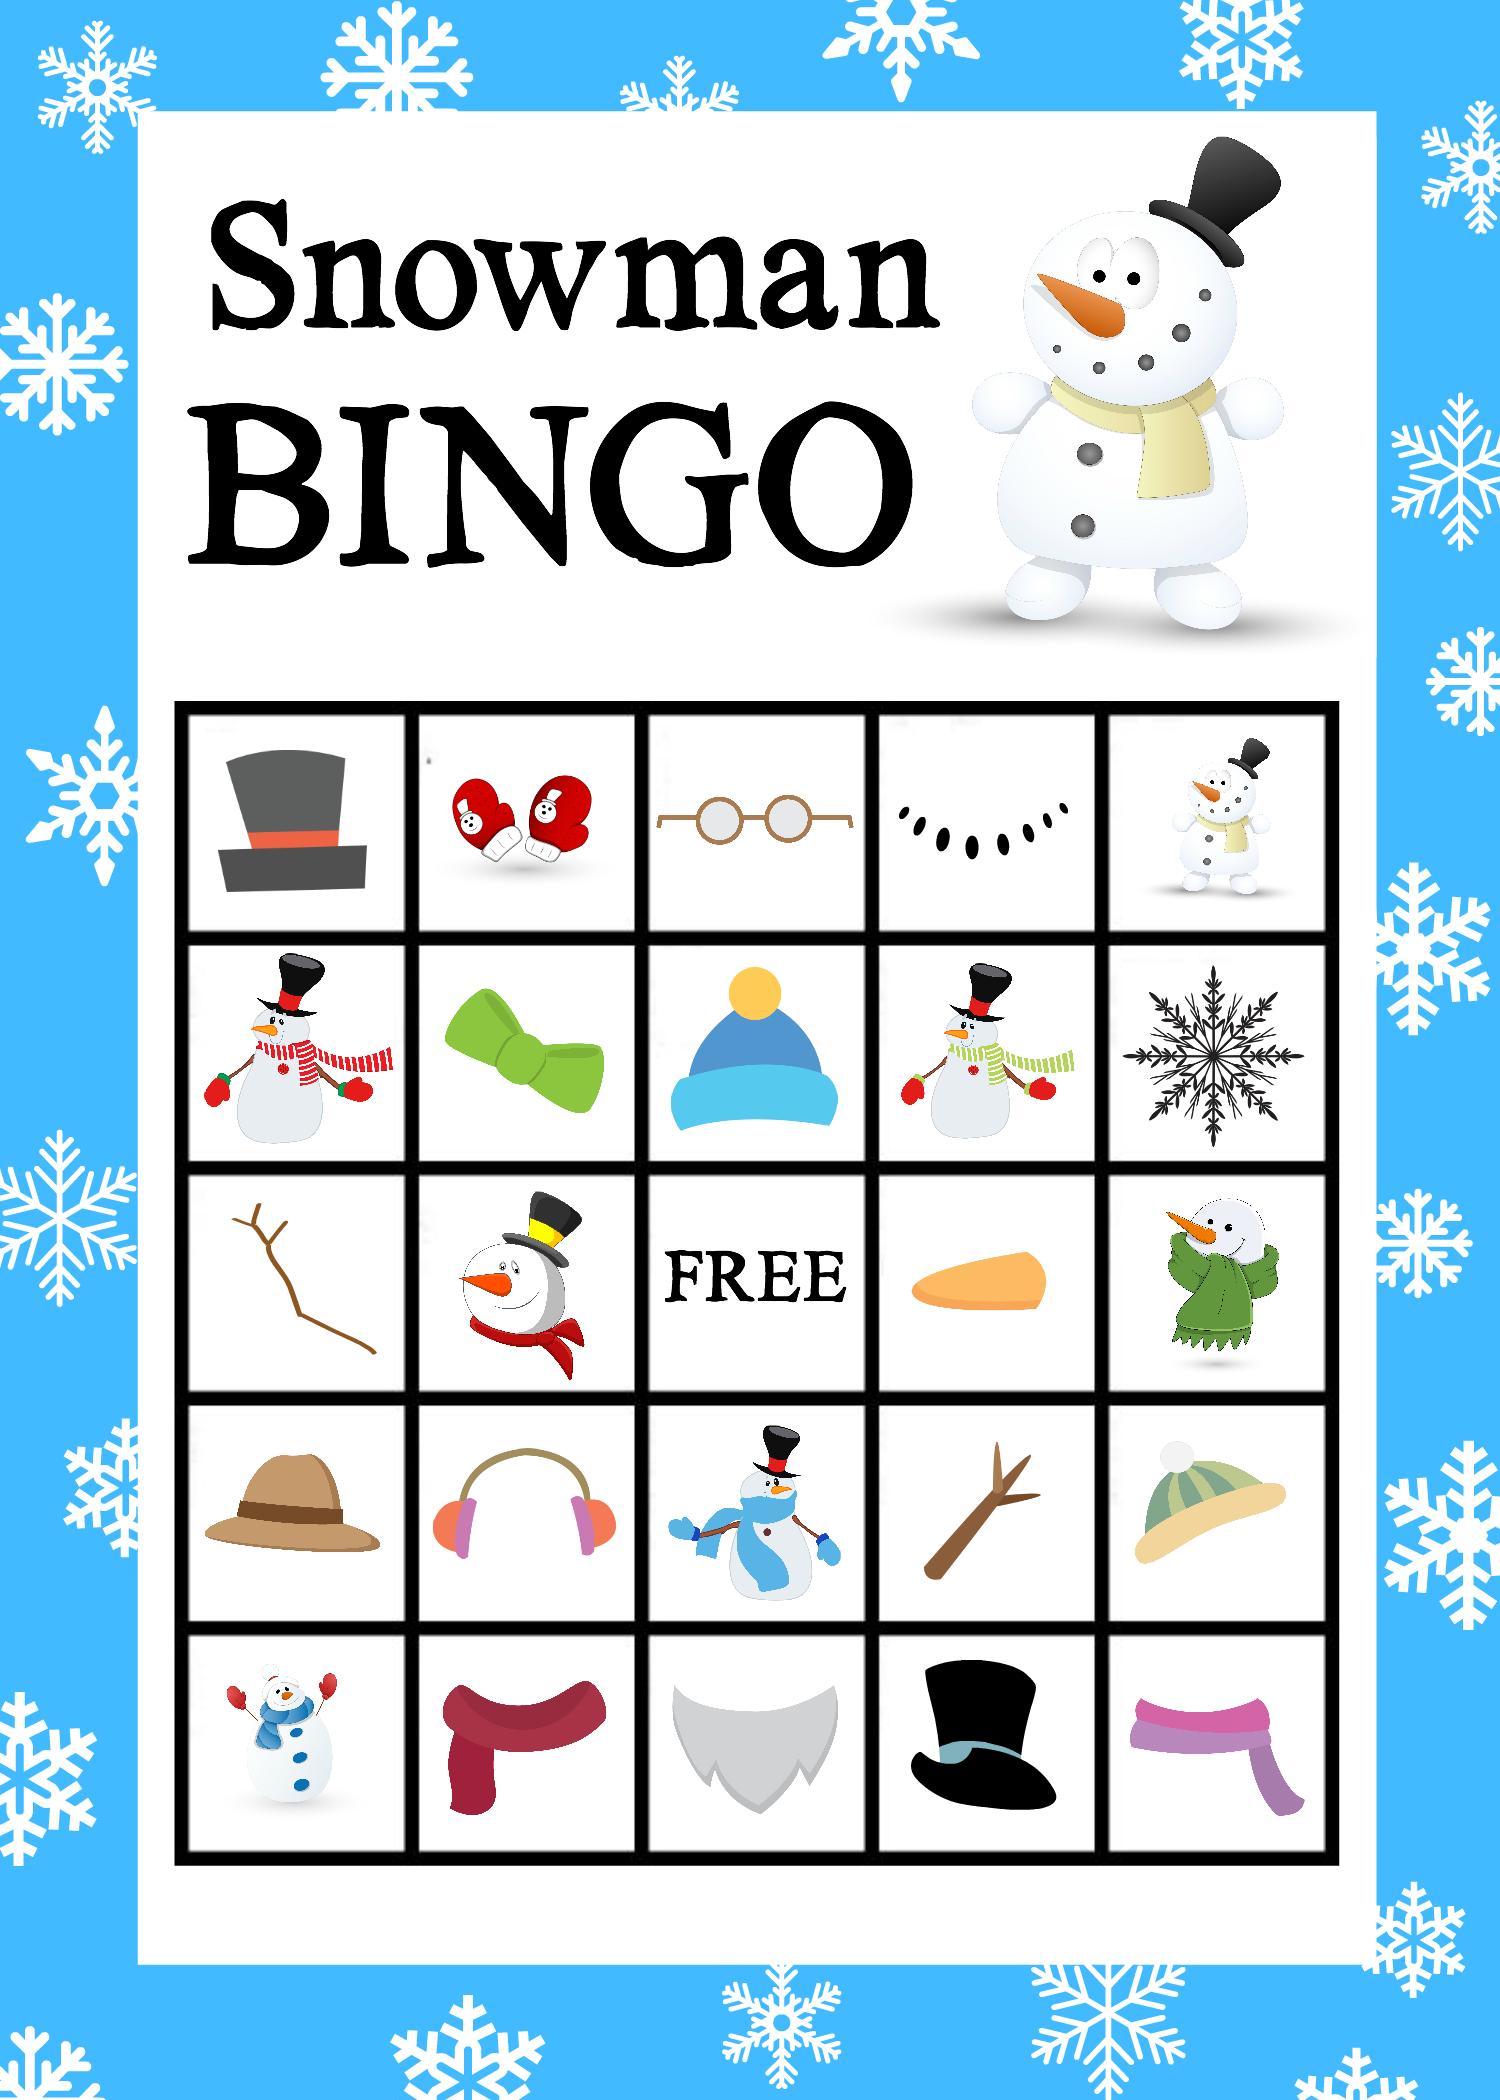 Bingo clipart keyword. Printable snowman game crazy